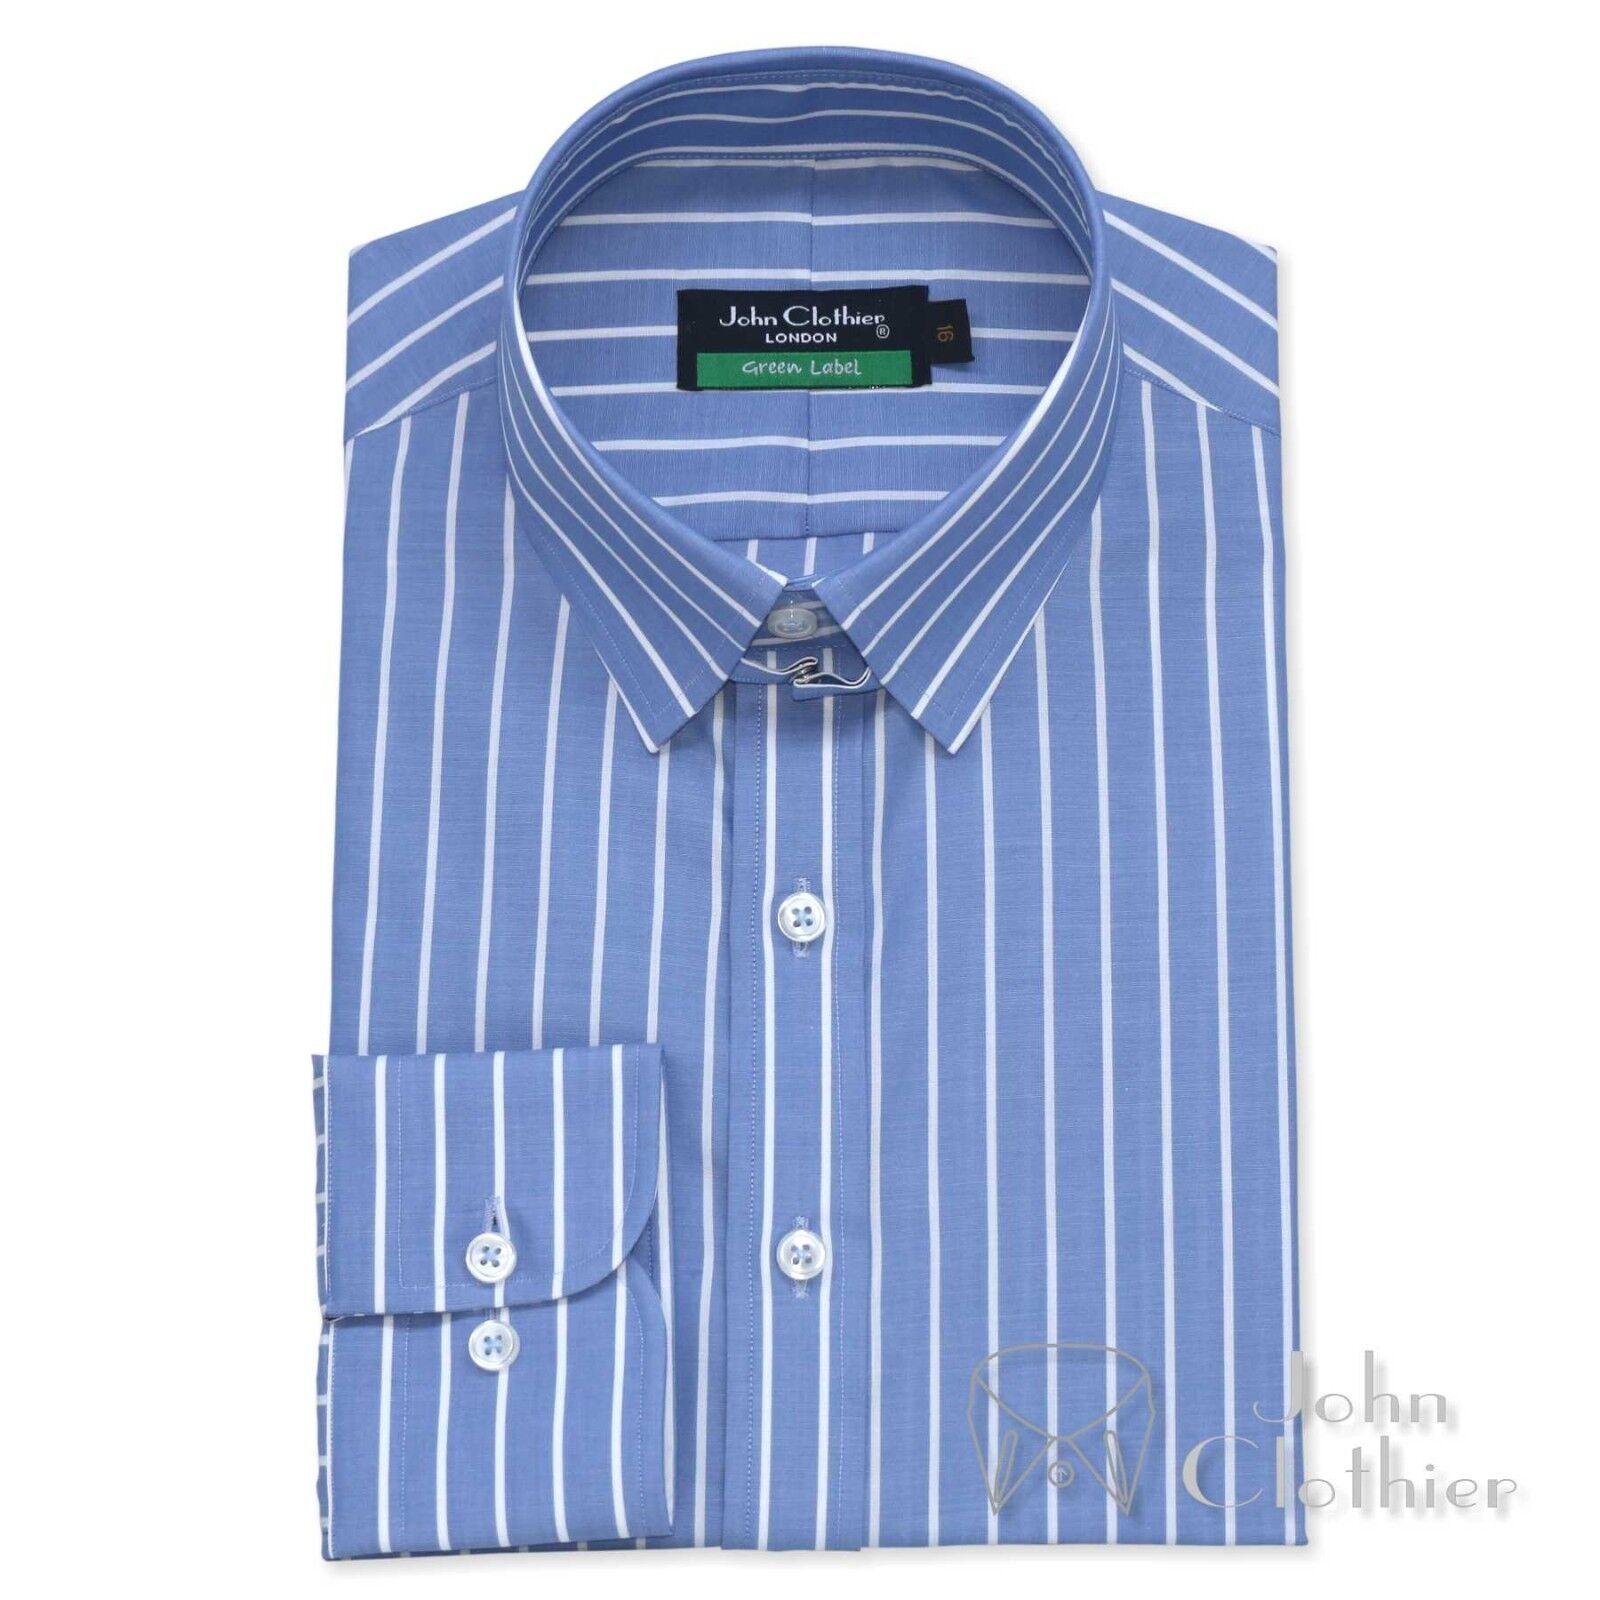 New  Herren Tab collar Cotton shirt Blau Weiß stripes Loop James Bond collar Gents